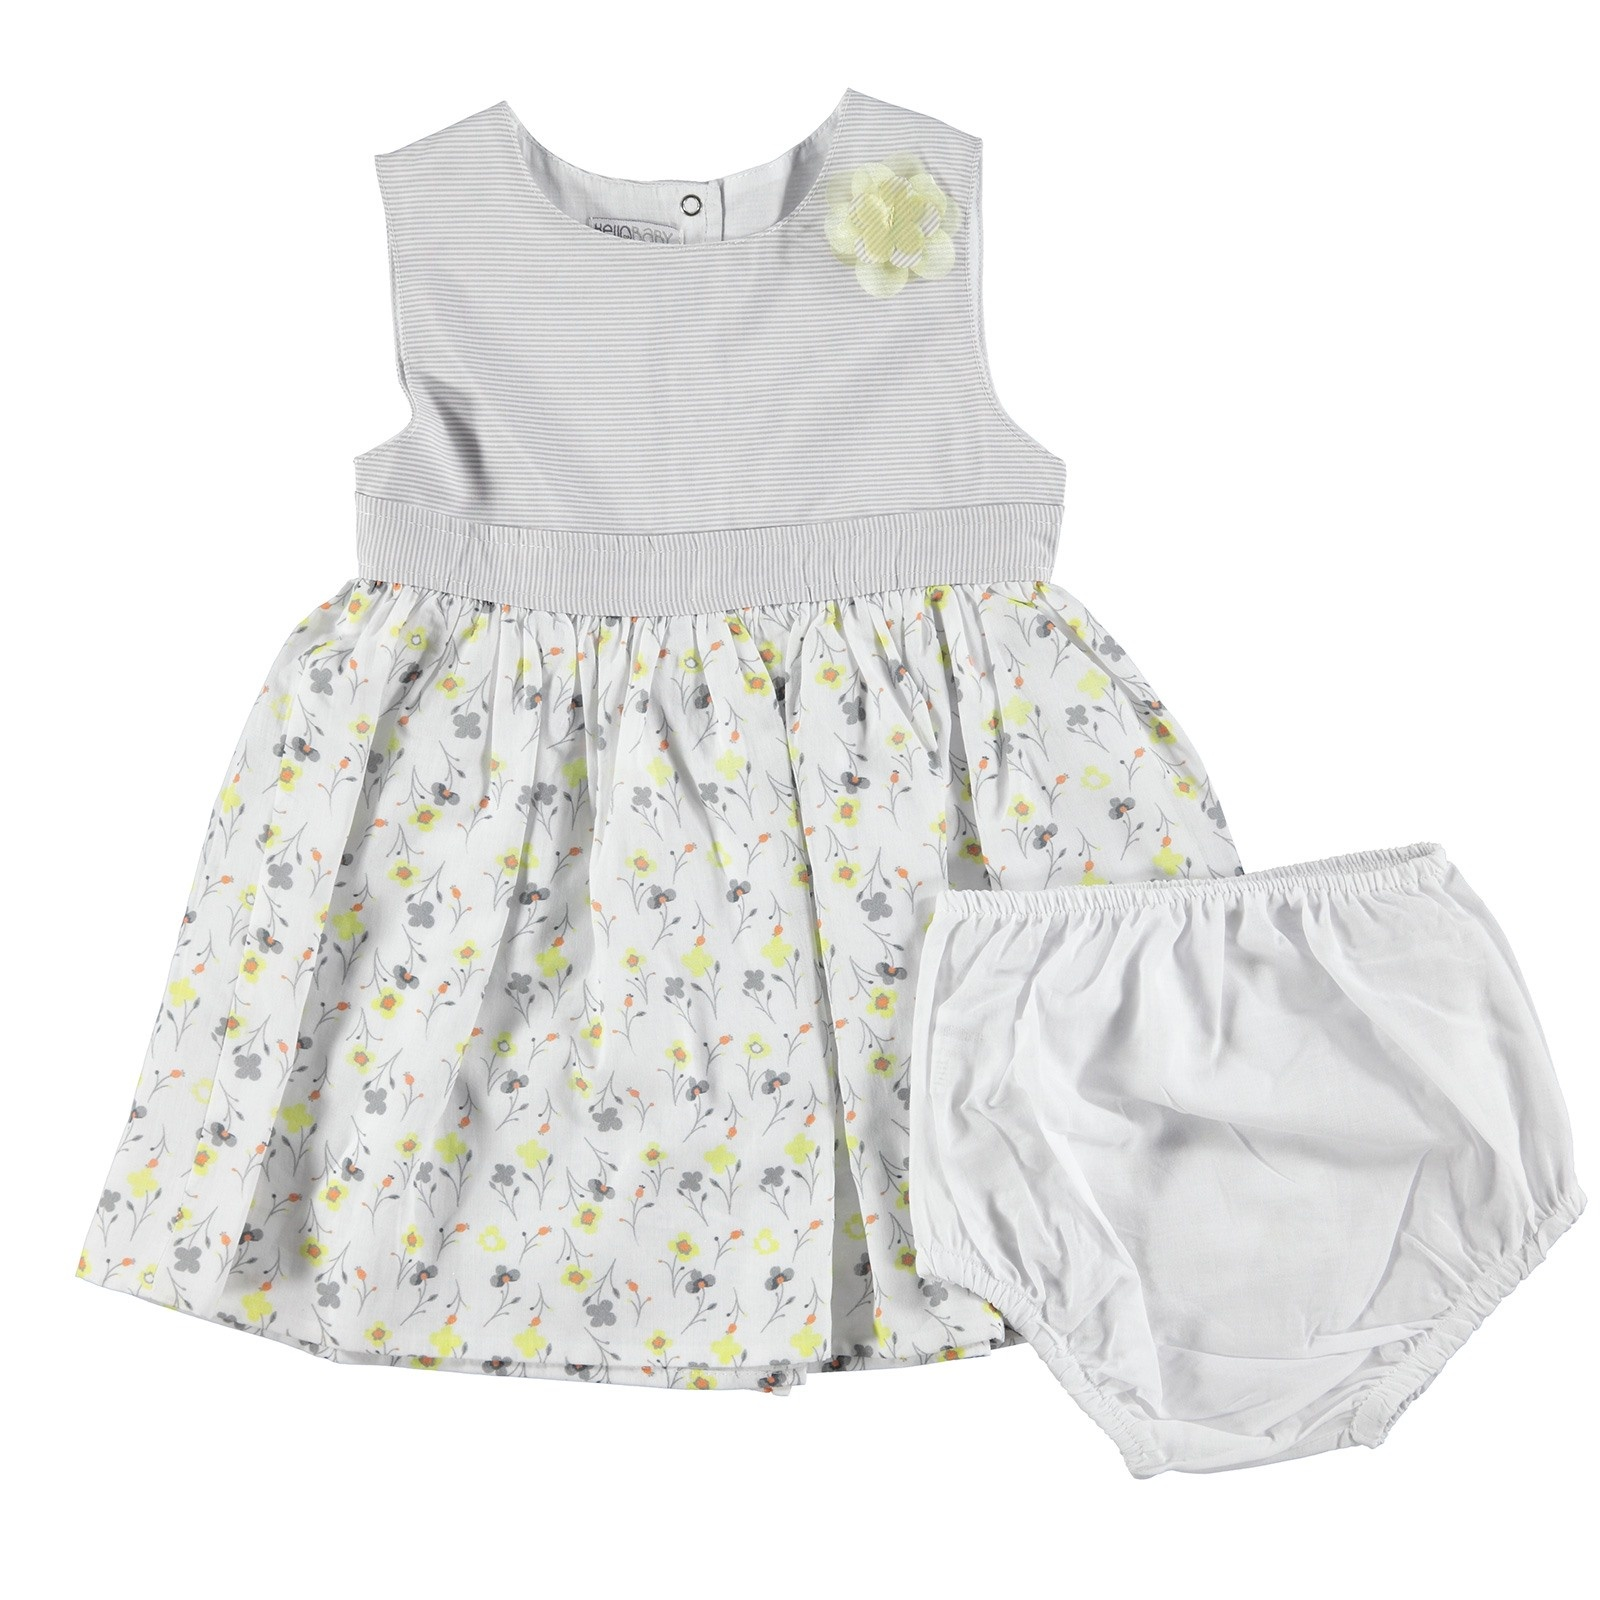 Ebebek HelloBaby Love Theme Baby Girl Sleeveless Dress